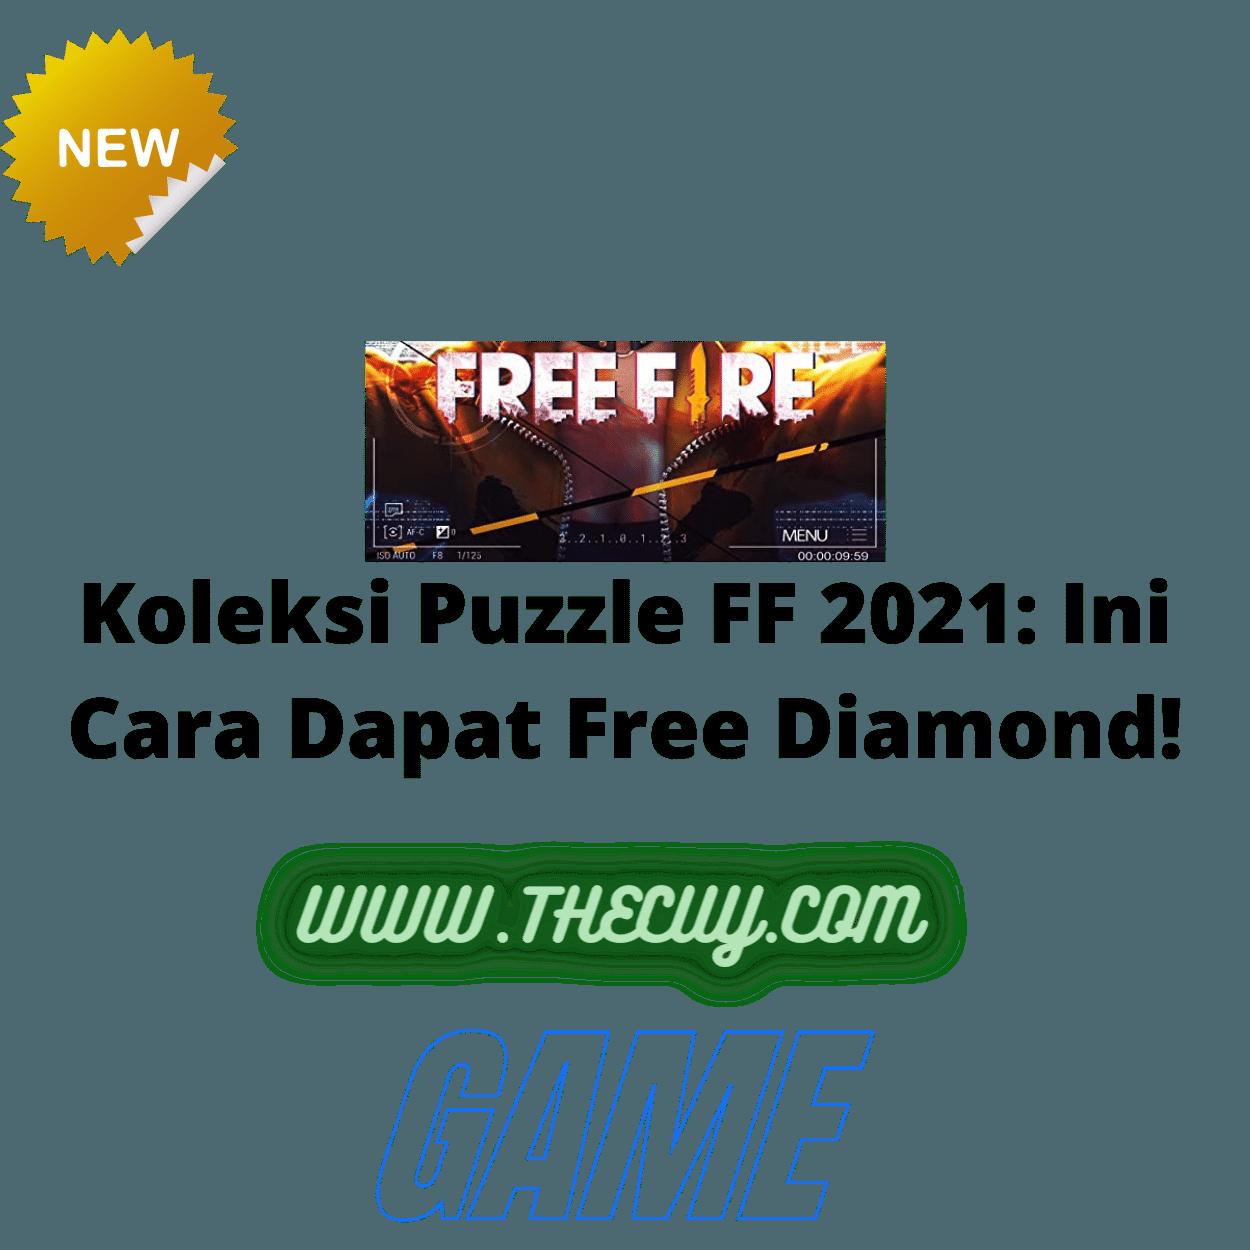 Koleksi Puzzle FF 2021: Ini Cara Dapat Free Diamond!